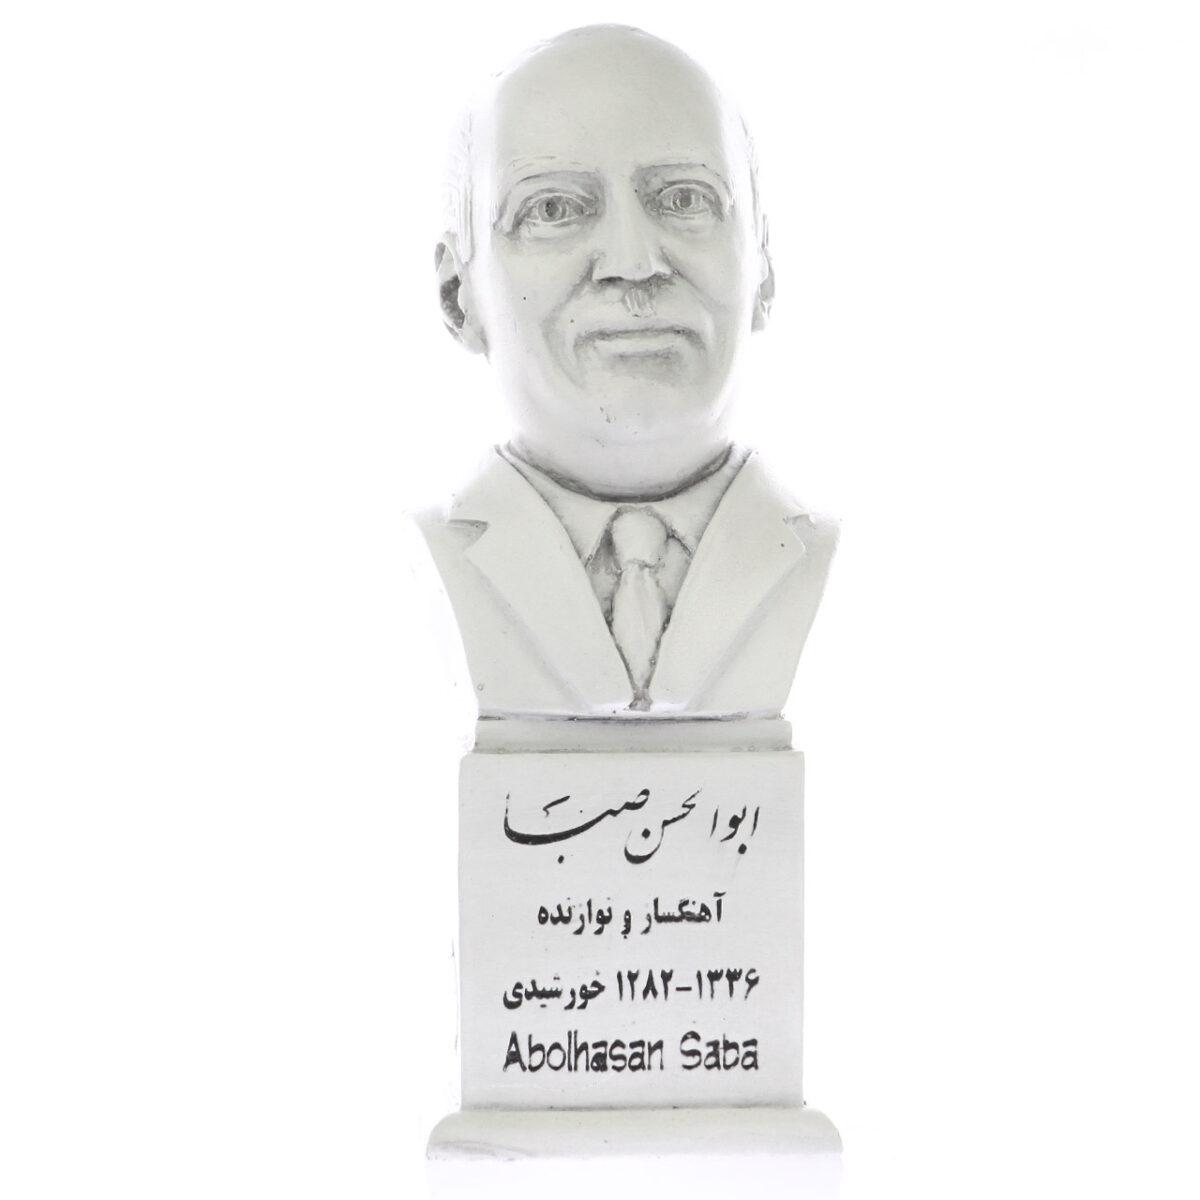 سردیس استاد ابوالحسن صبا